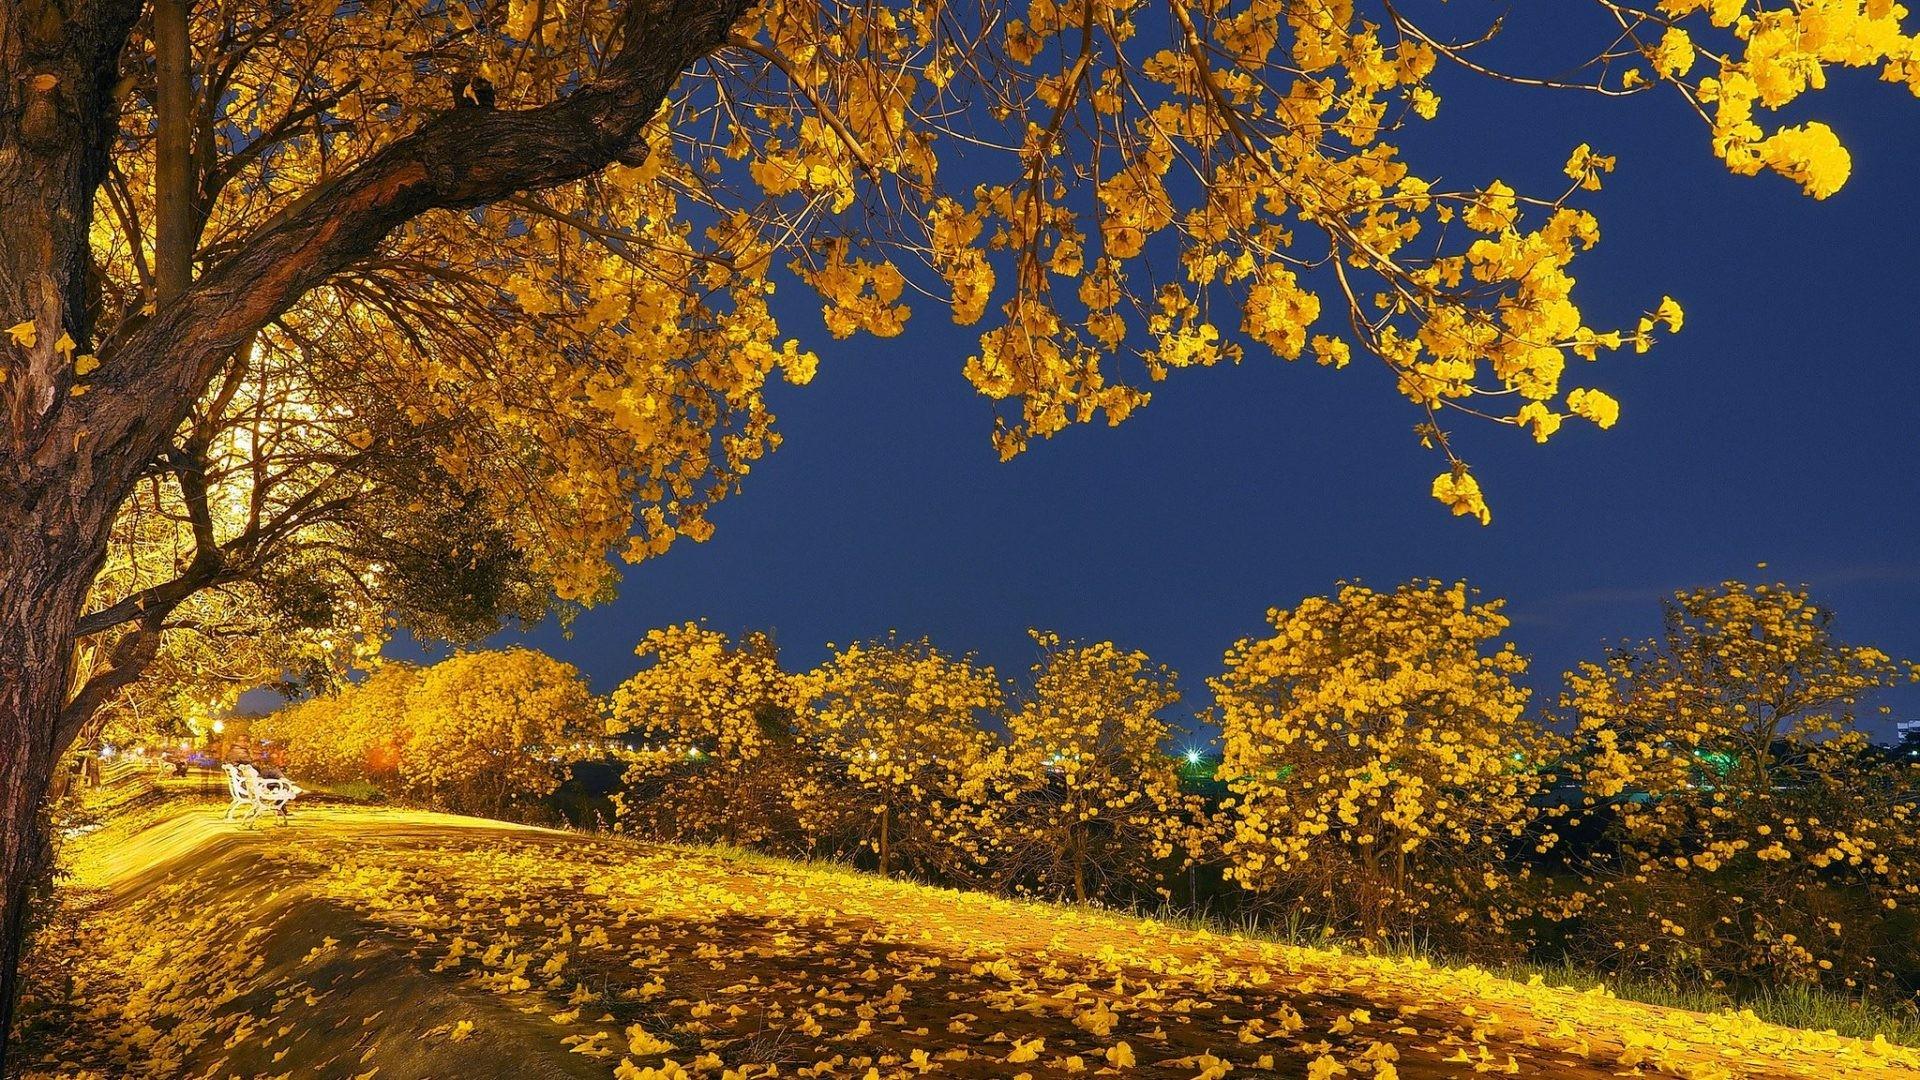 Falling Tag – Falling Nature Night Yellow Trees Sky Tree Autumn Leaves  Tonight Park Landscape Fall